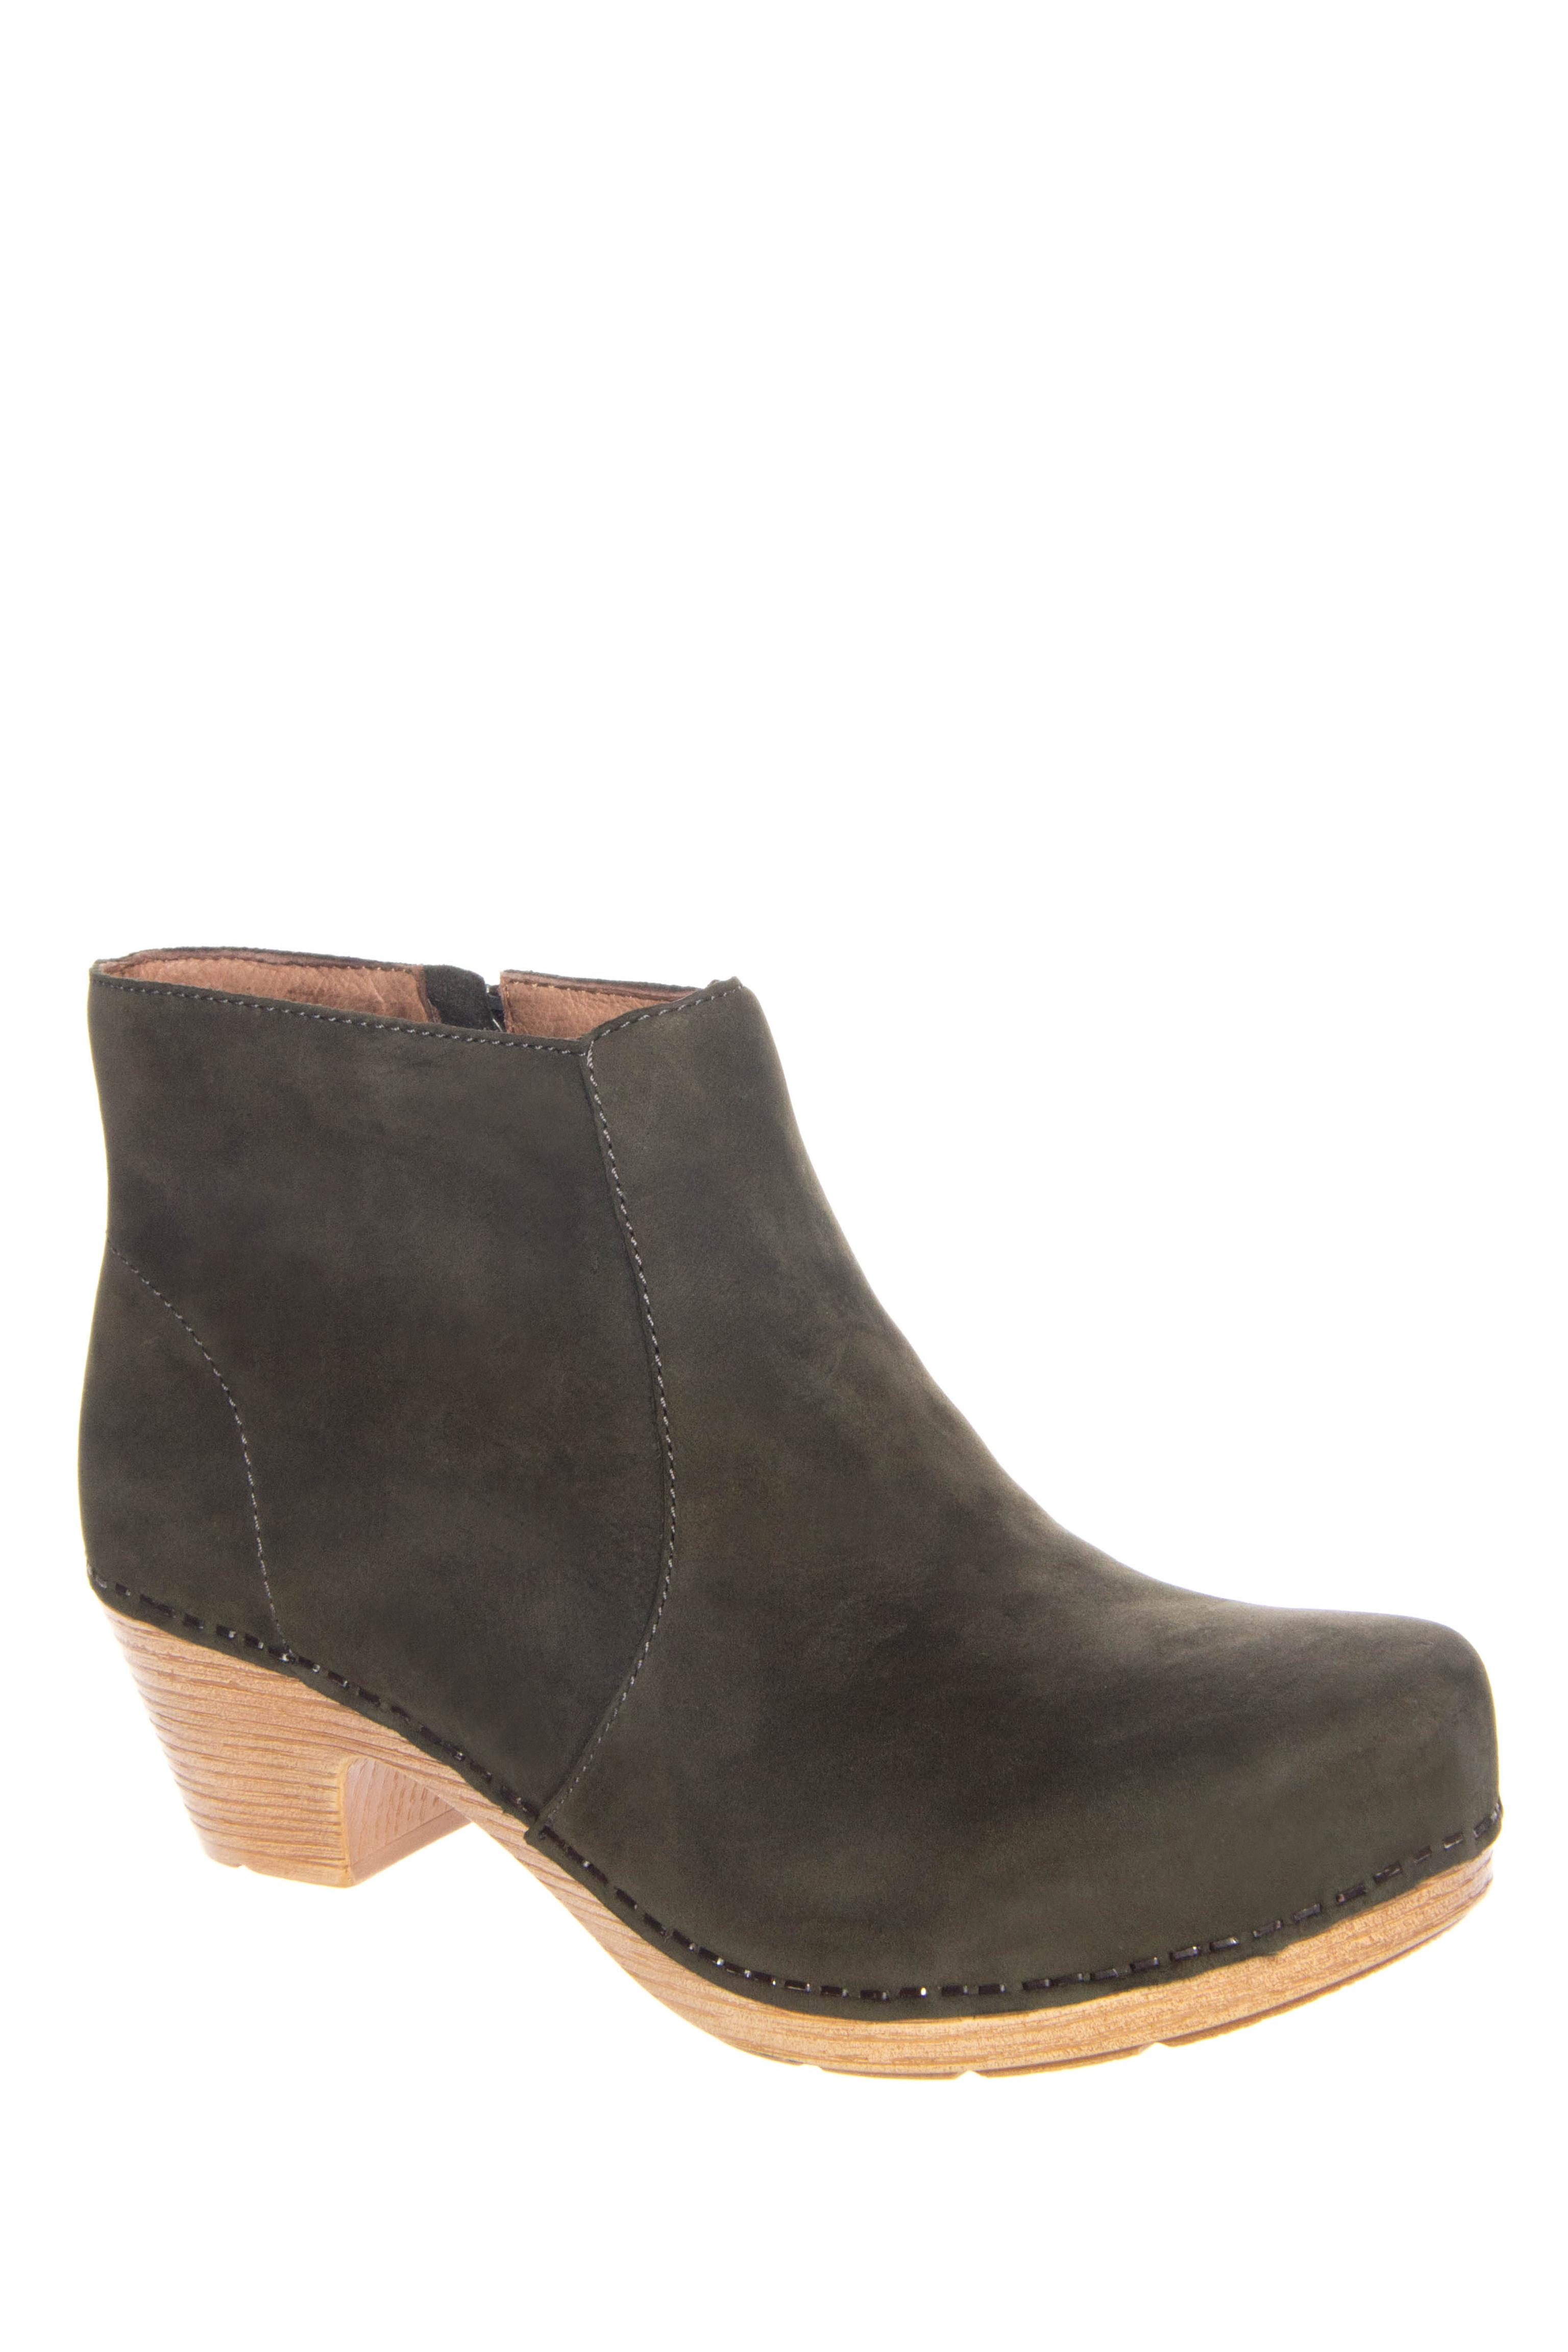 Dansko Maria Milled Low Heel Booties - Olive